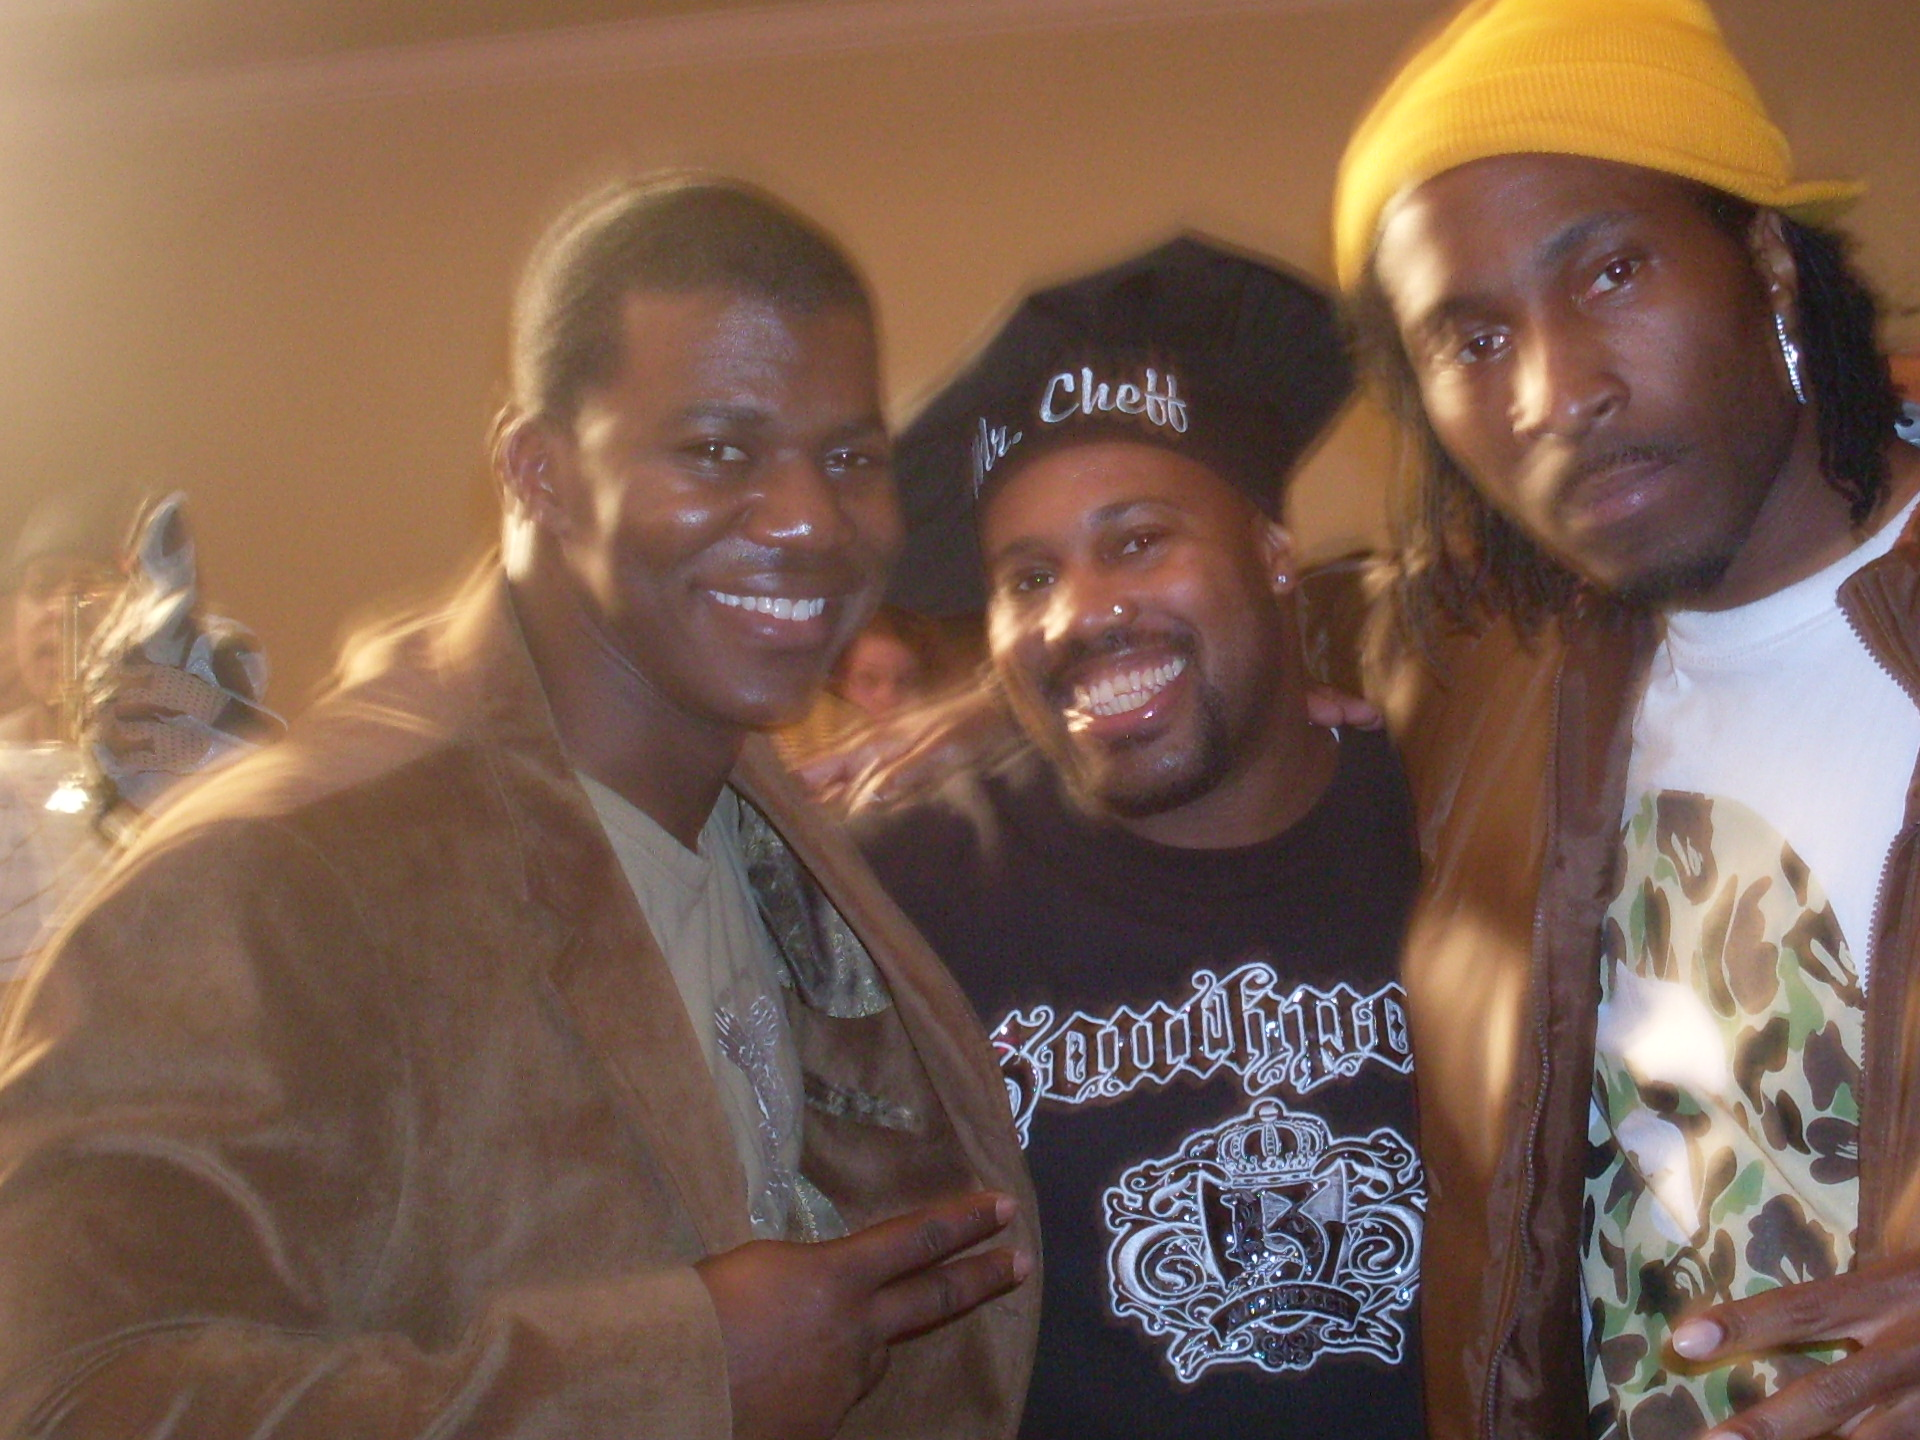 DJ HOLLYWOOD,MR CHEFF,&DJ BONAY